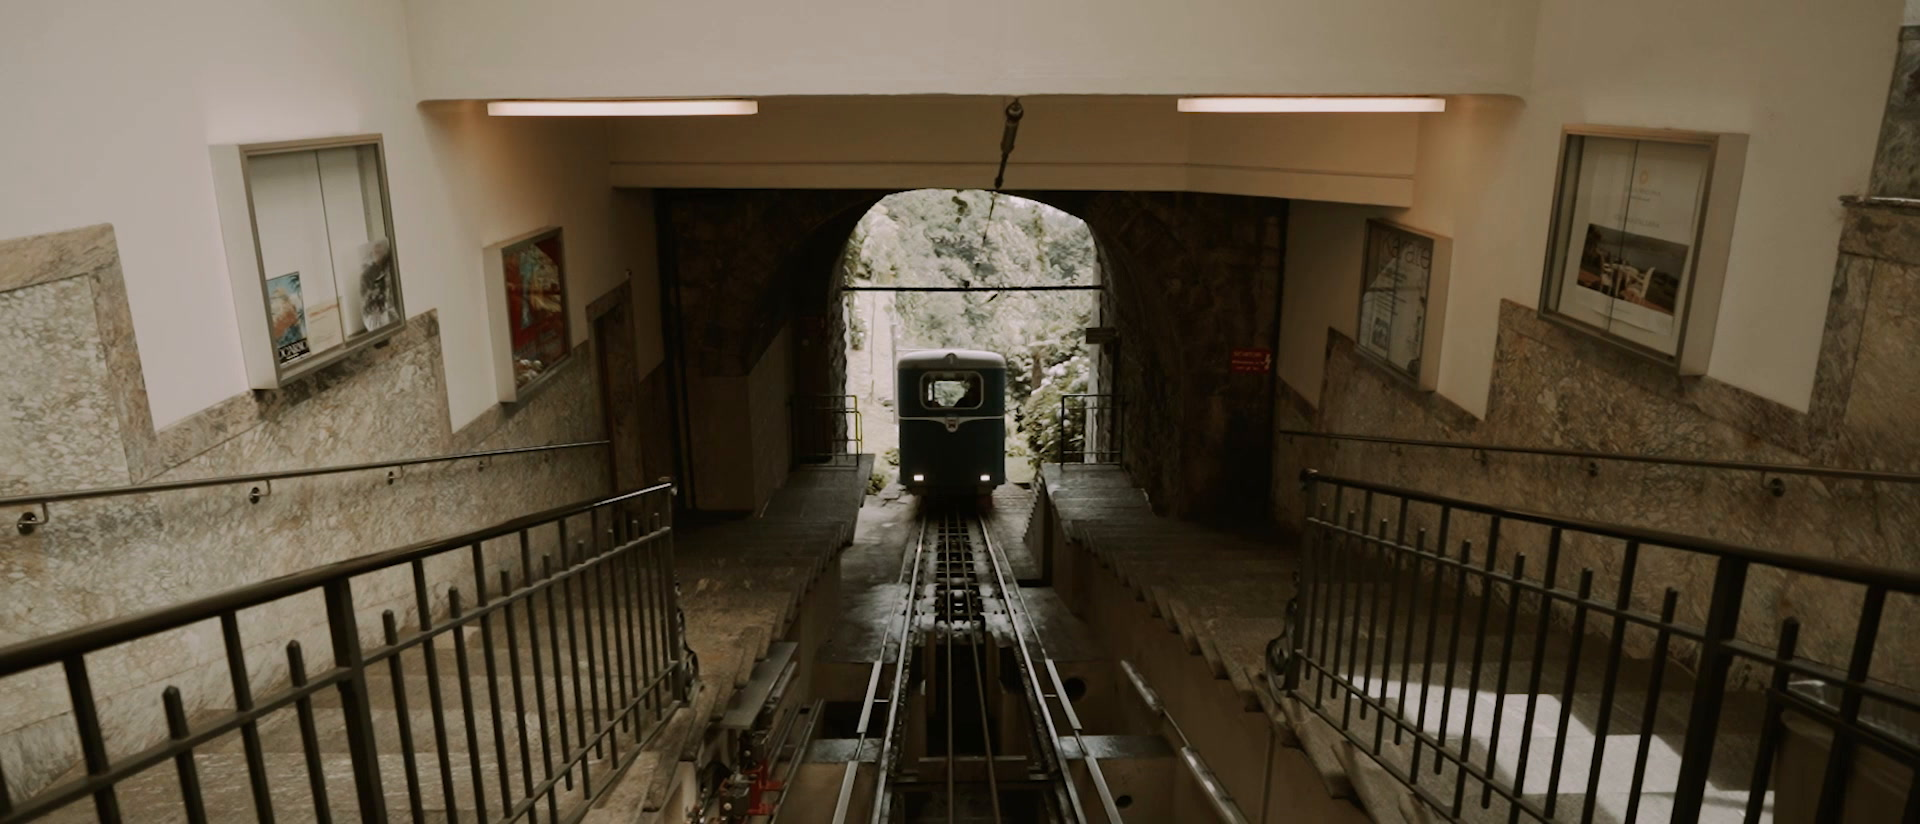 ian + anais | Locarno, Switzerland | villa orselina